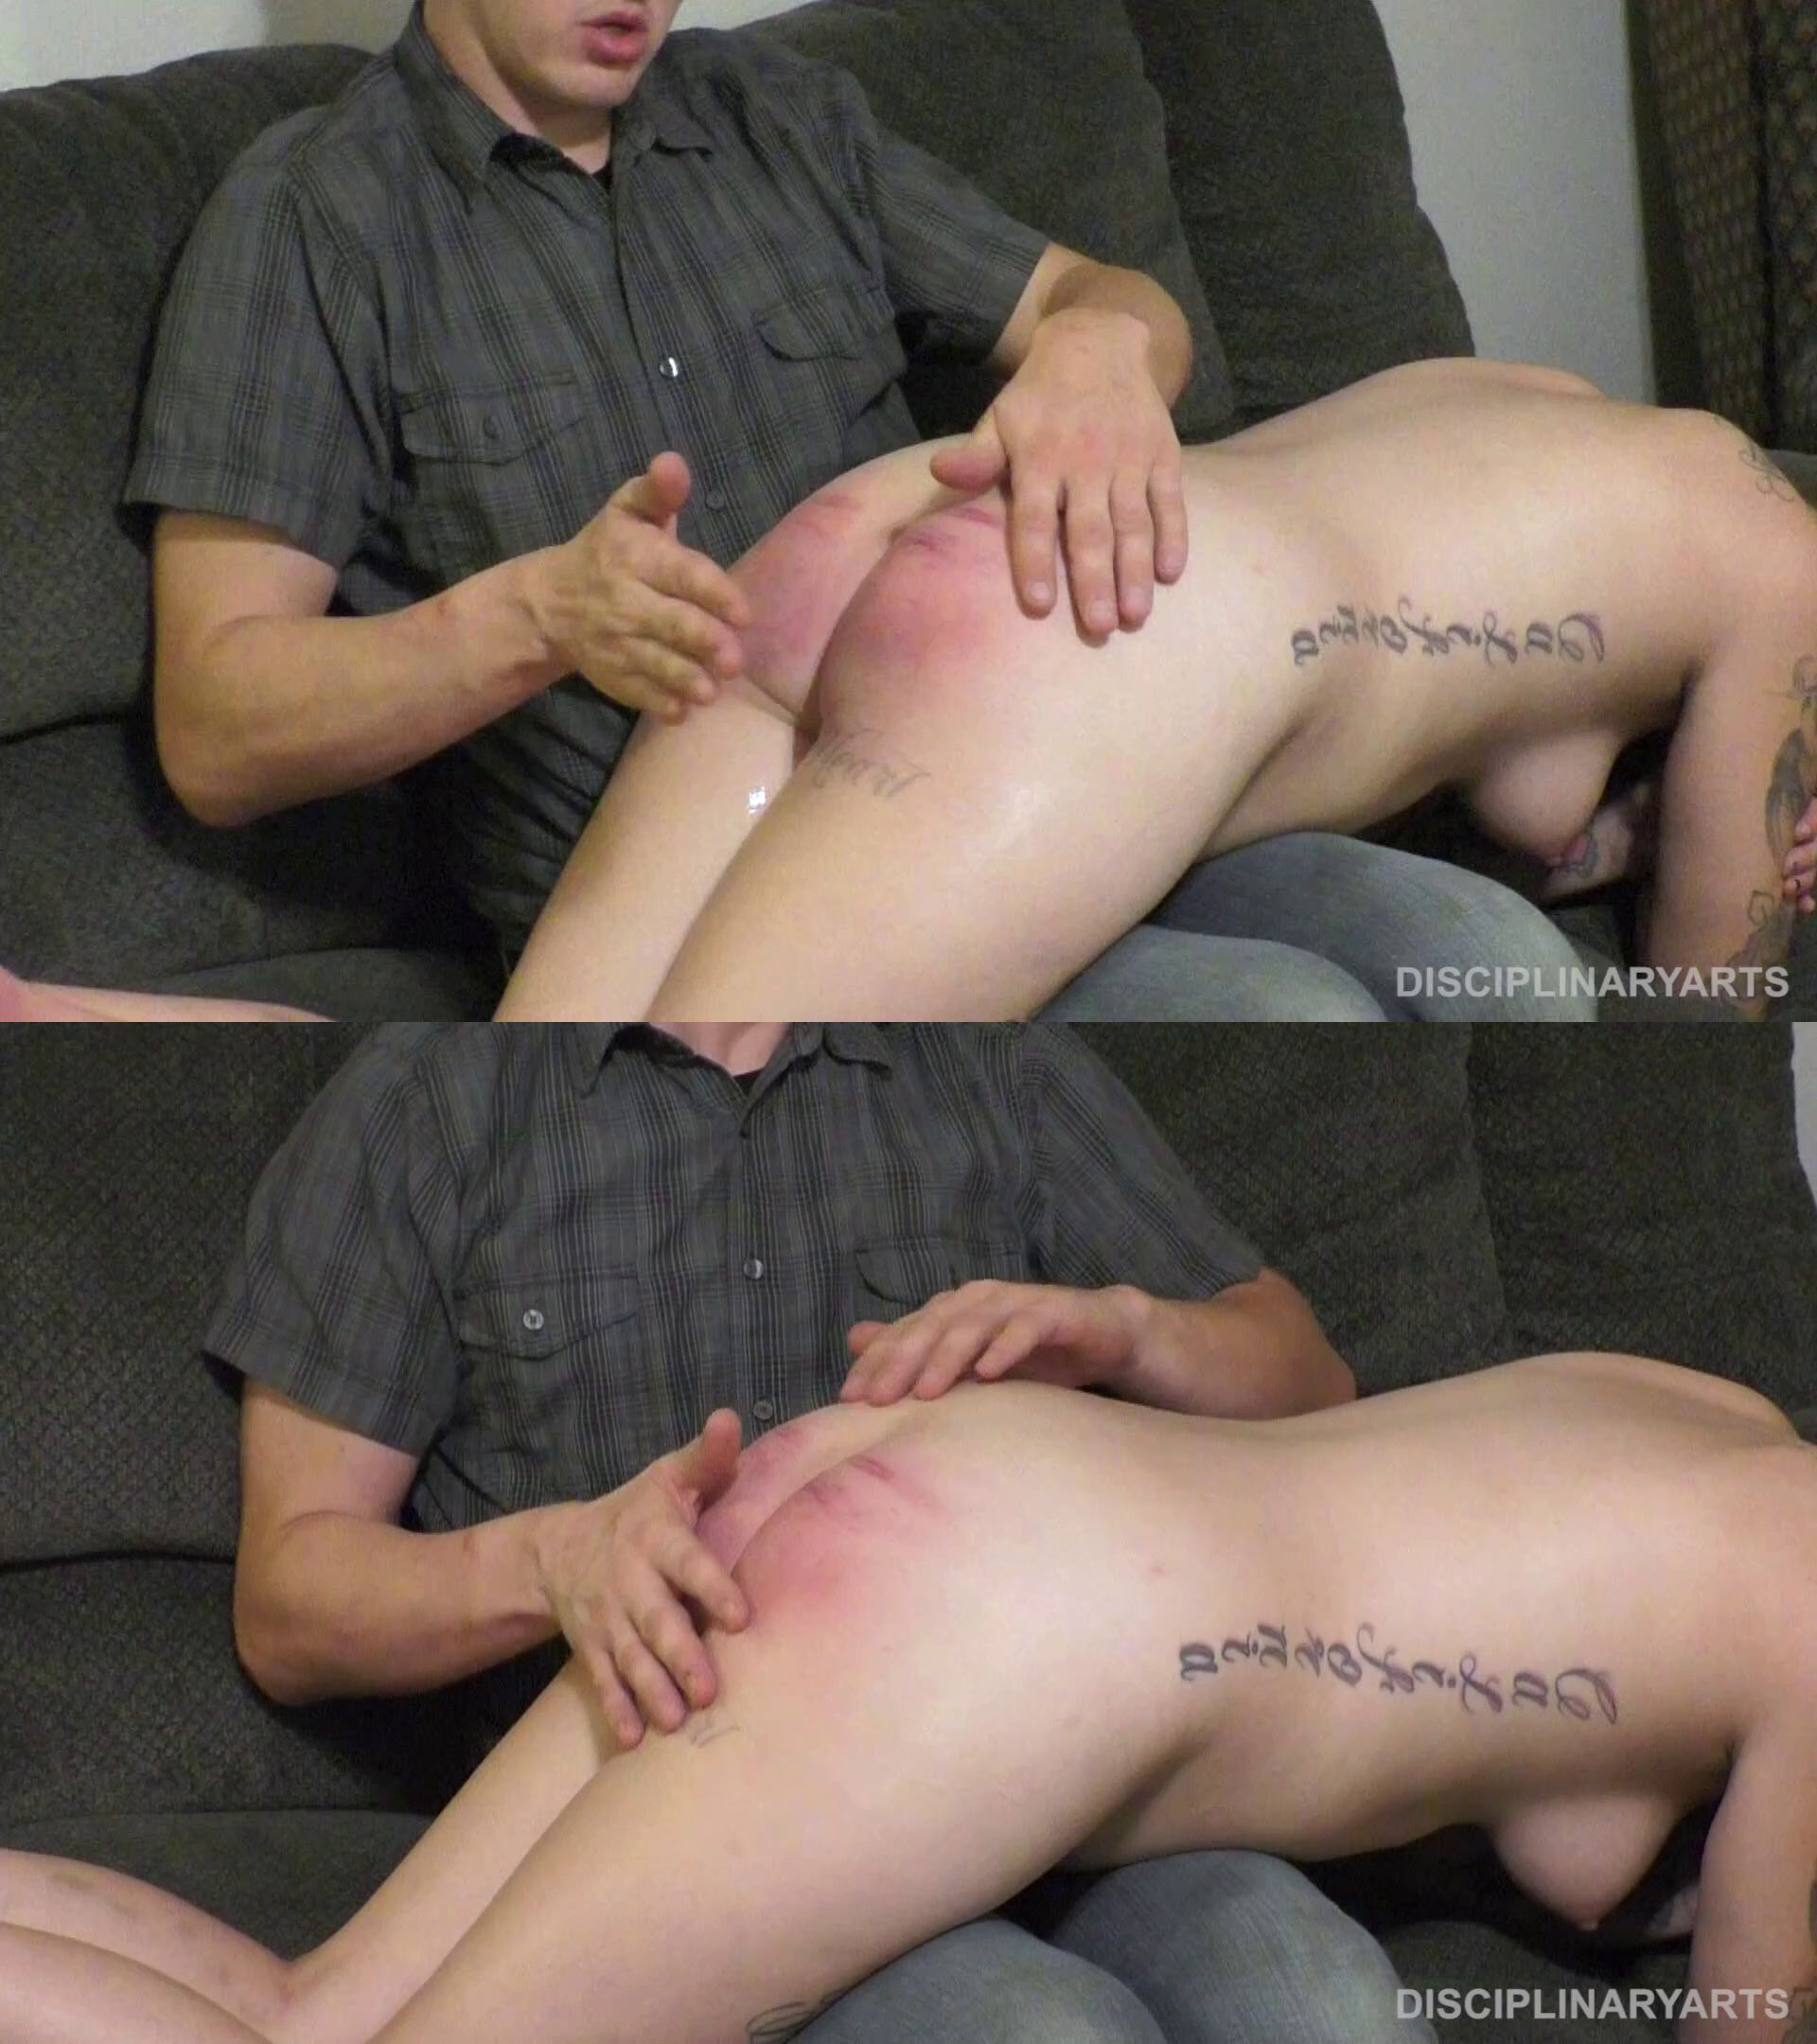 Disciplinary Arts – MP4/Full HD – Kyle Johnson, Kasey – Kaseys Nude Aftercare (Release date: Jul. 13, 2021)